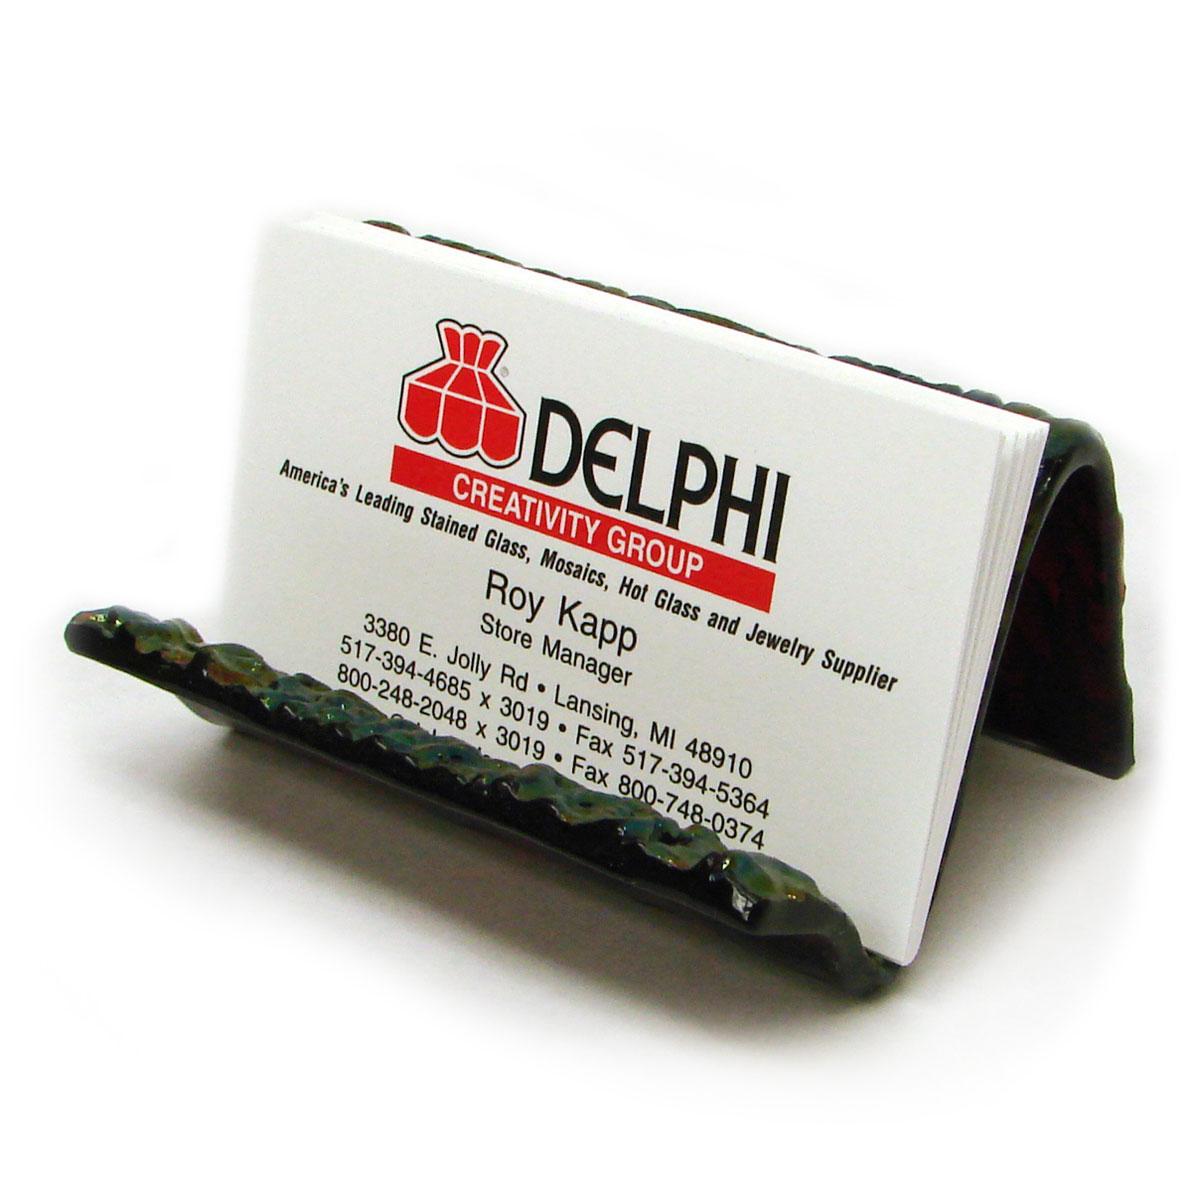 Business card holder decor molds delphi glass decor molds business card holder colourmoves